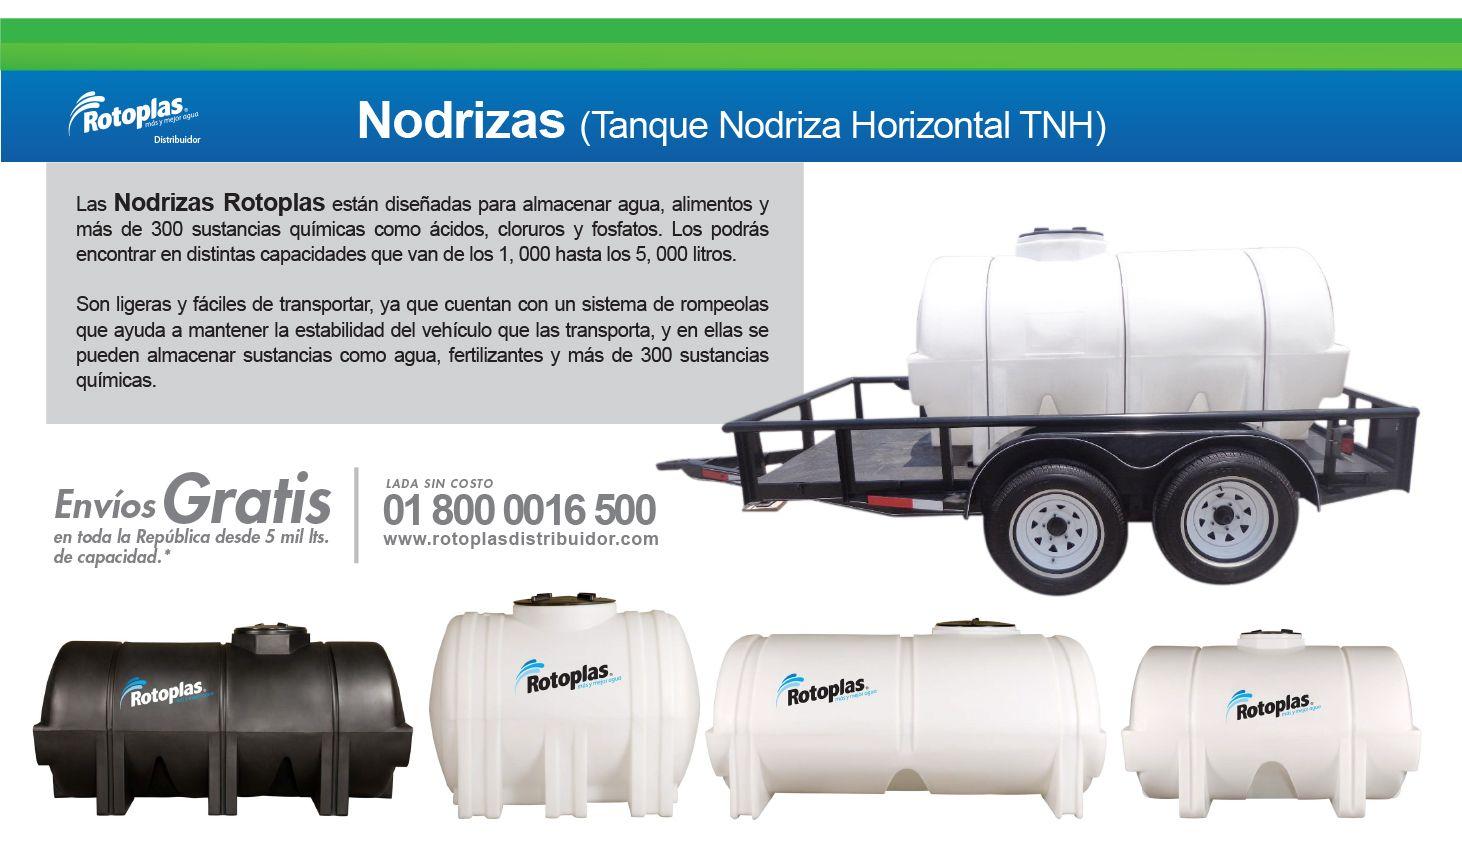 Nodrizas rotoplas tanques rotoplas nodrizas agua lada for Tanque de agua rotoplas